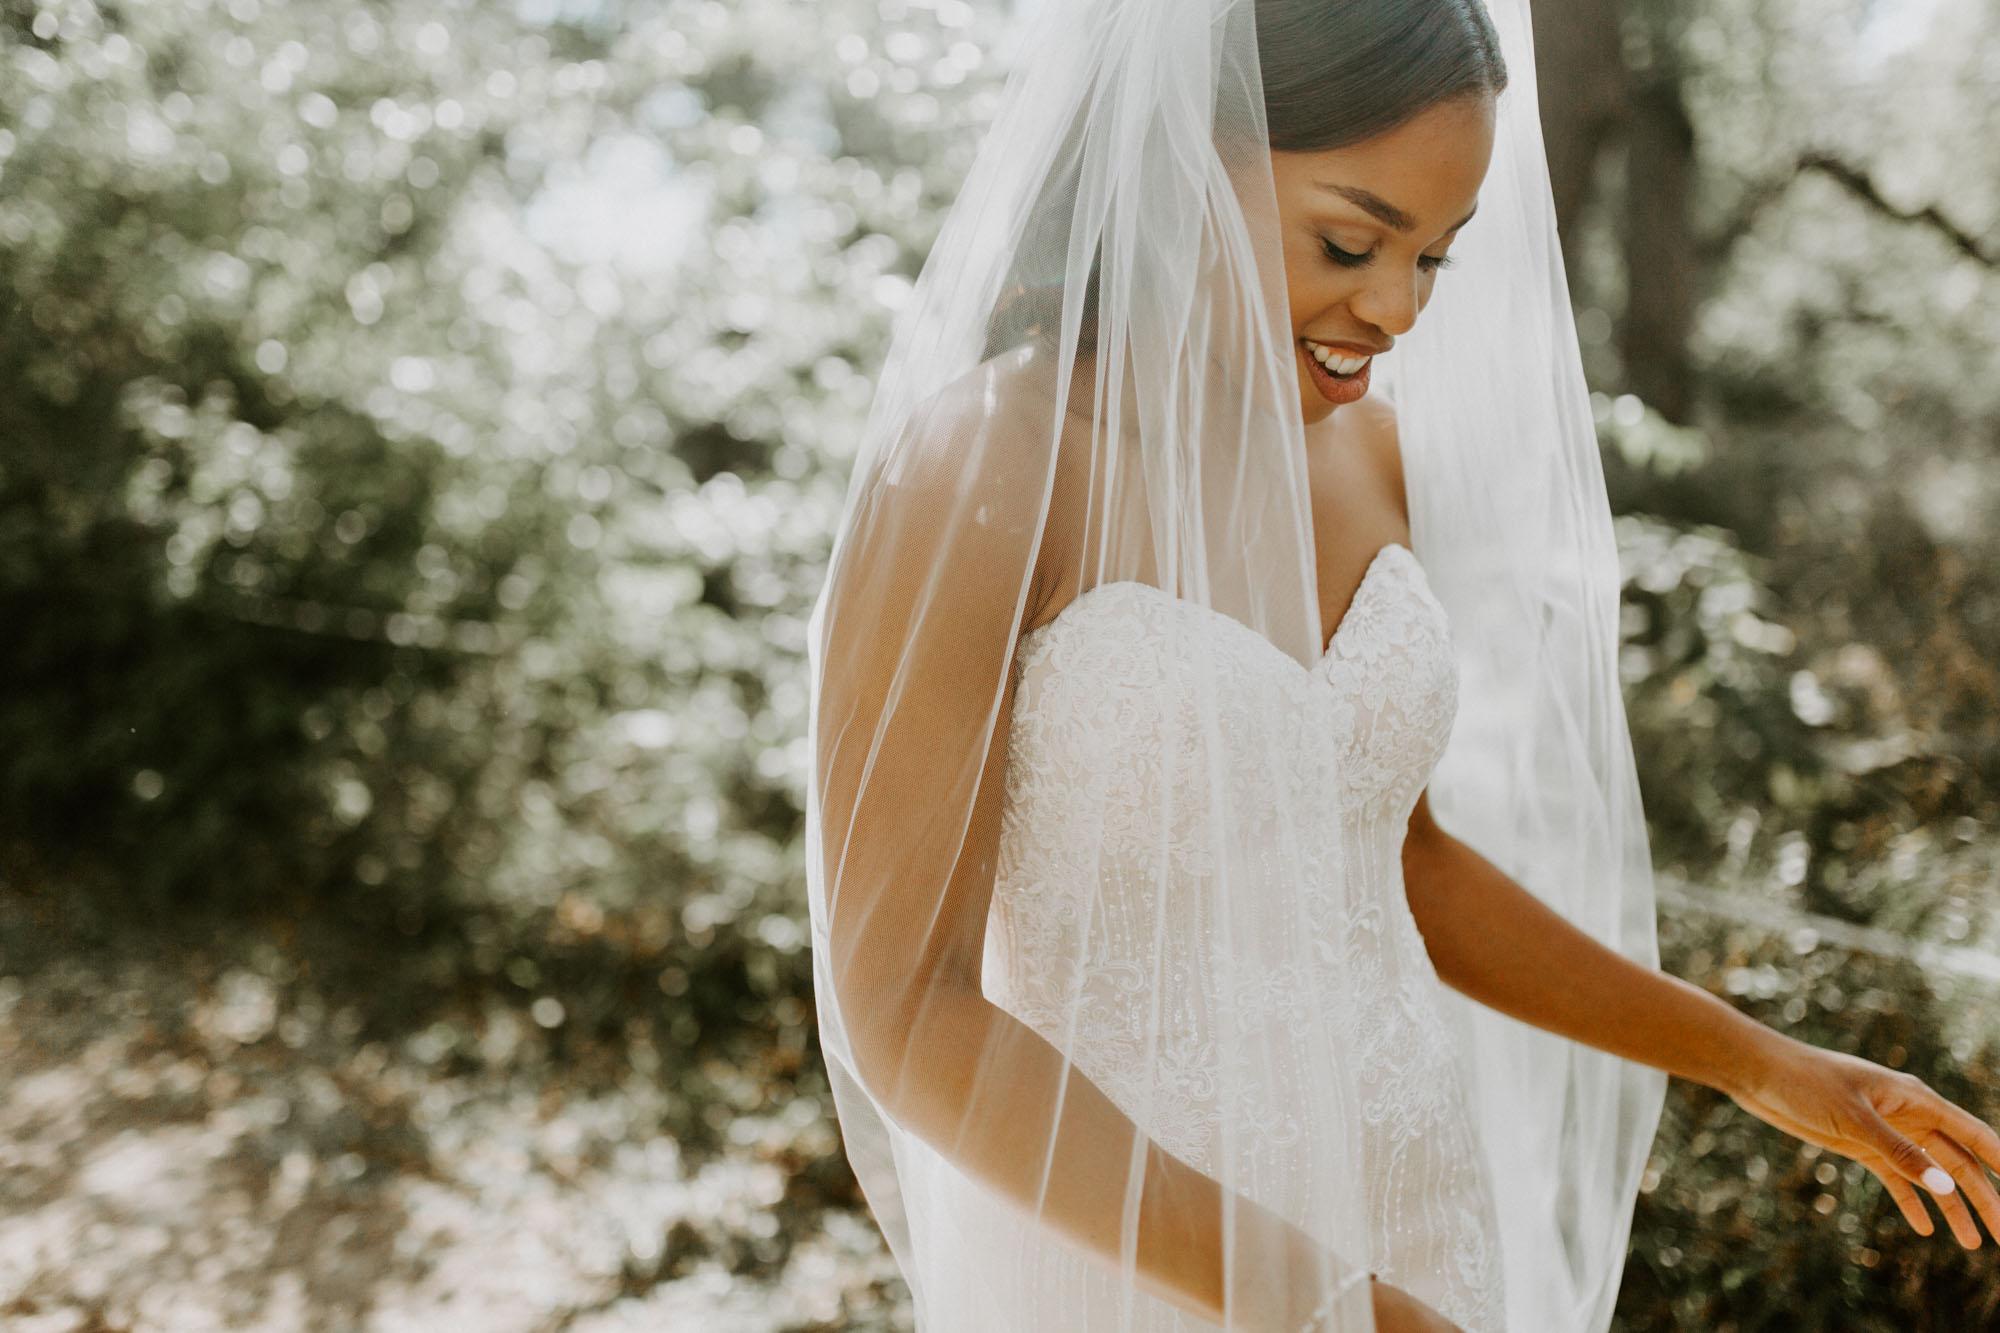 prairie_glass_house_wedding_champaign_wright_photographs_simon_0054.jpg